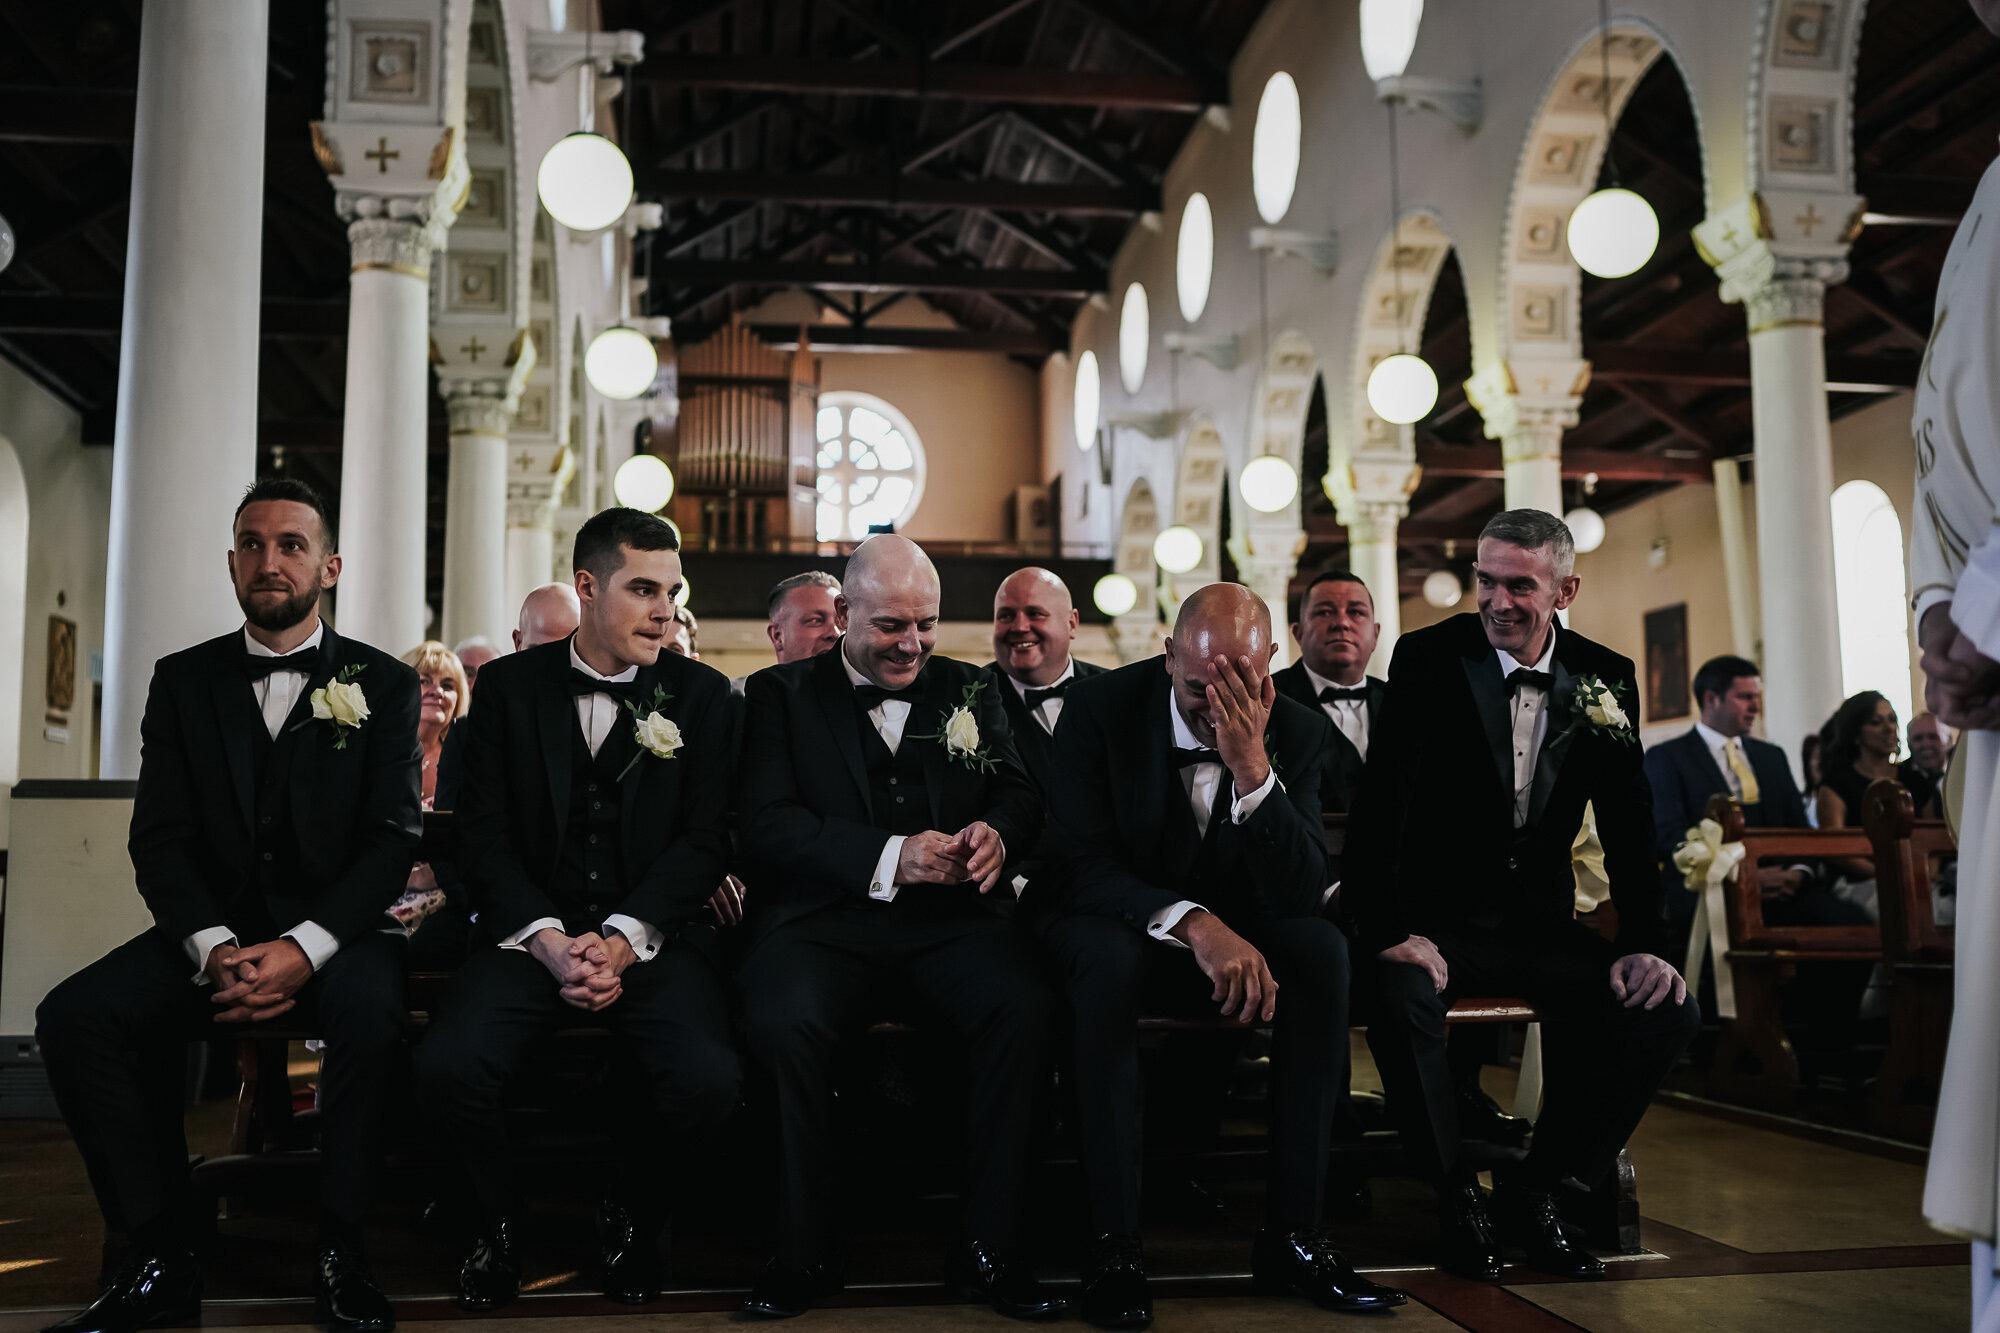 Clontarf Caste wedding photographer Wedding Photography dublin ireland wedding photographer (21 of 58).jpg